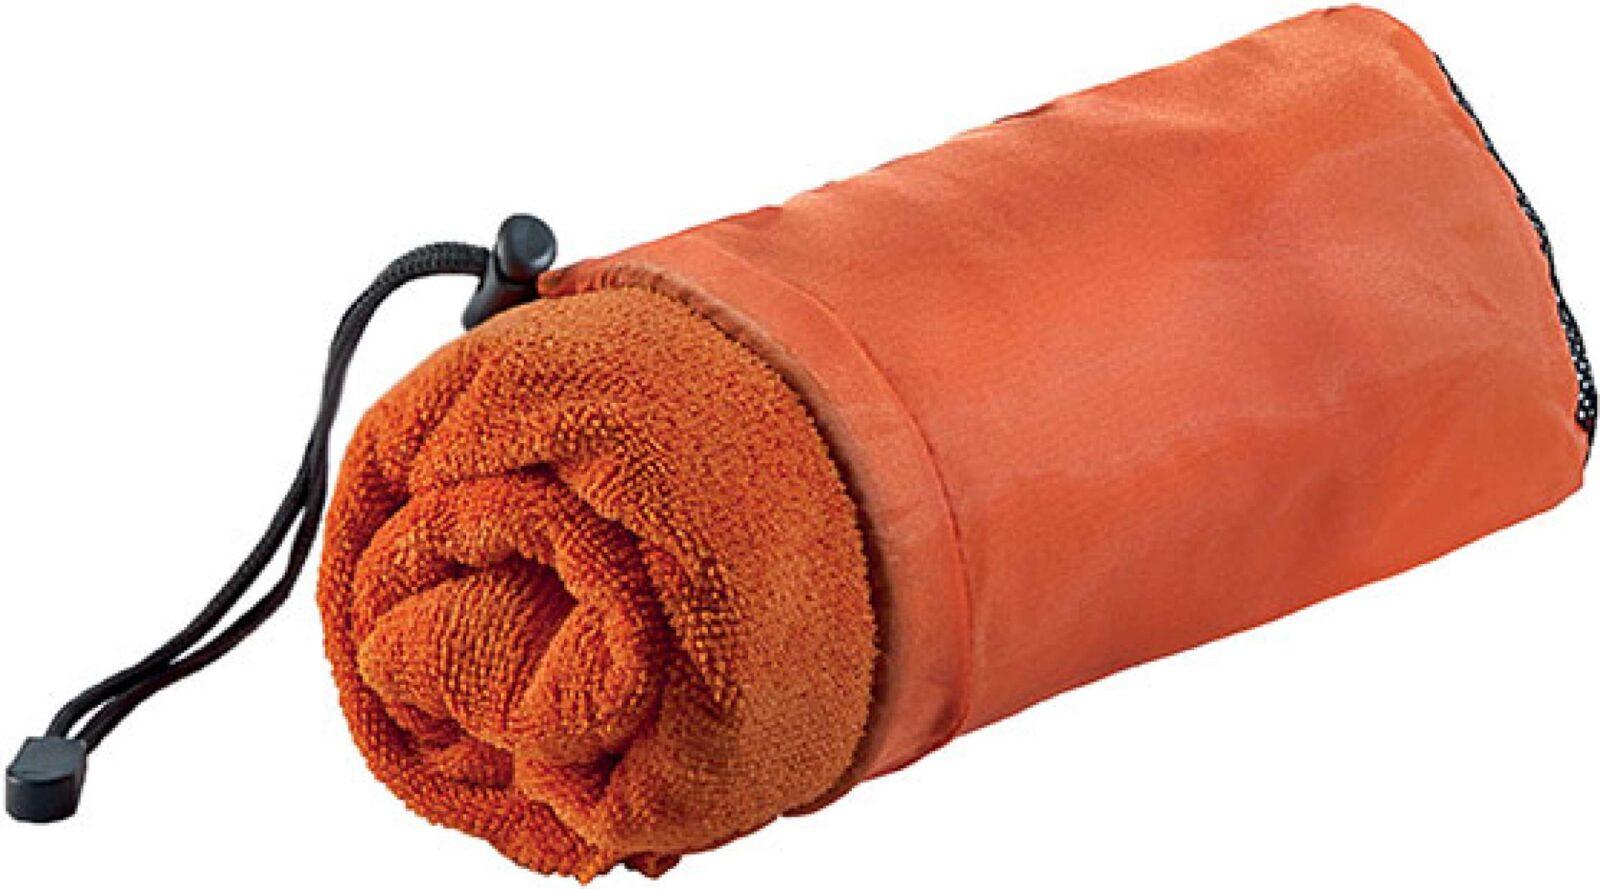 Prosop microfibra PA576 portocaliu orange Prosoape bumbac plaja baie bucatarie absorbante groase personalizate spa hotel broderie diverse dimensiuni